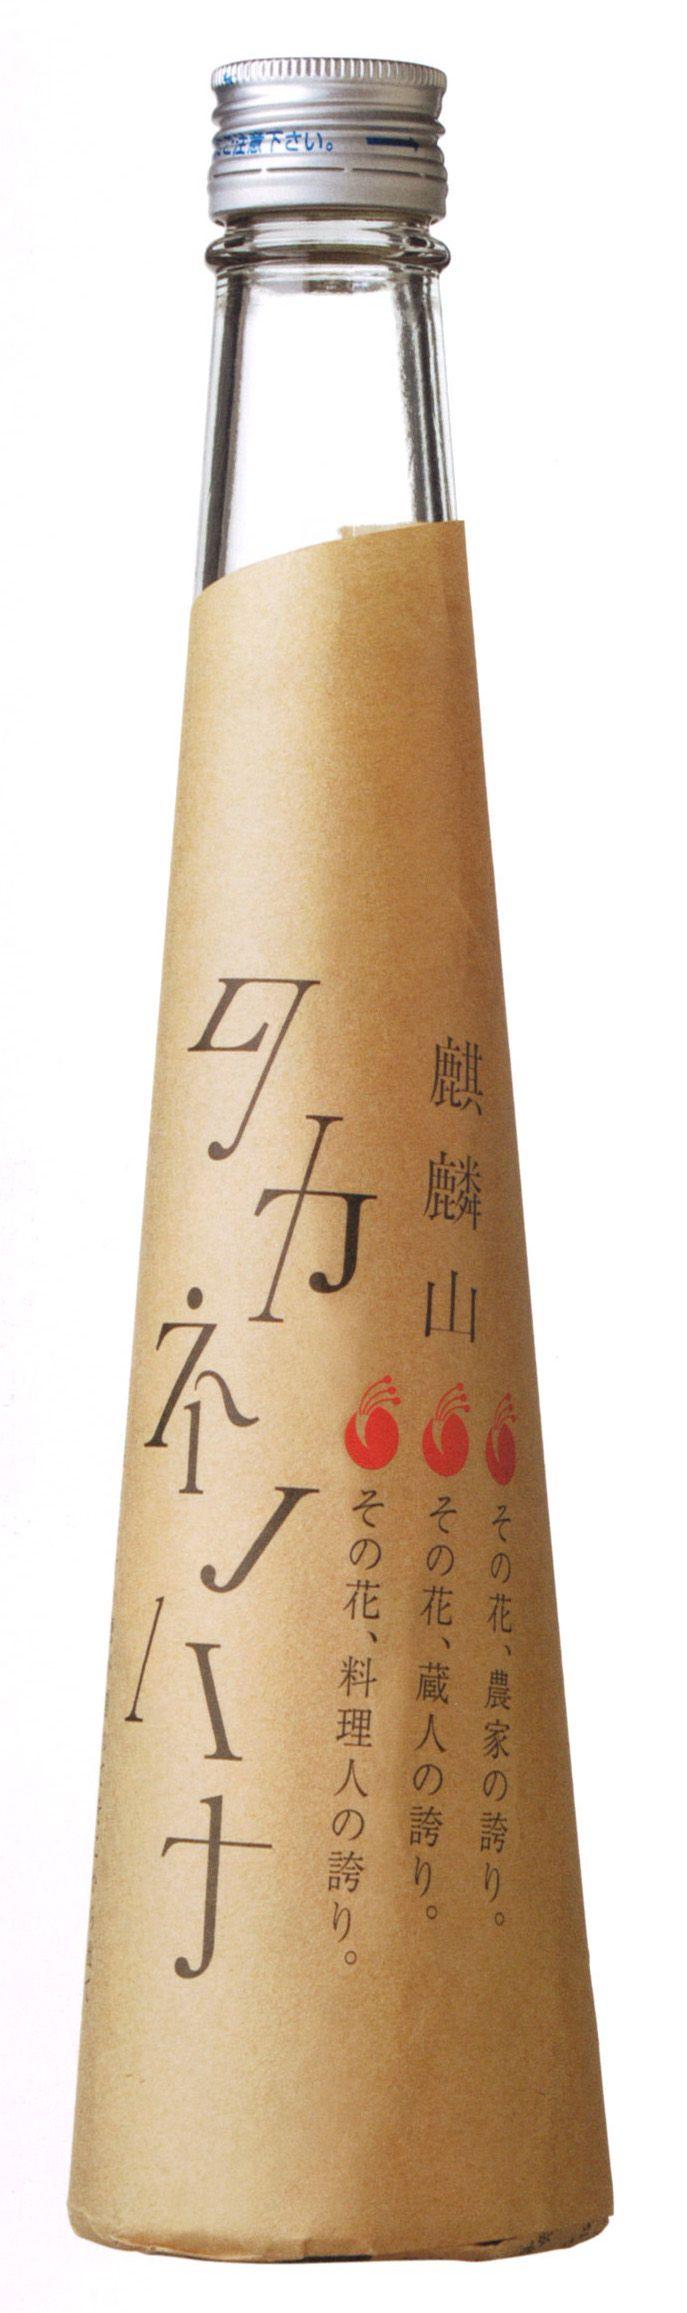 takane no hana by Kirinzan Shuzo | It might be a discontinued item. This is the Kirinzan Shuzo (Sake-brewing company) website | http://www.kirinzan.co.jp/lineup.html